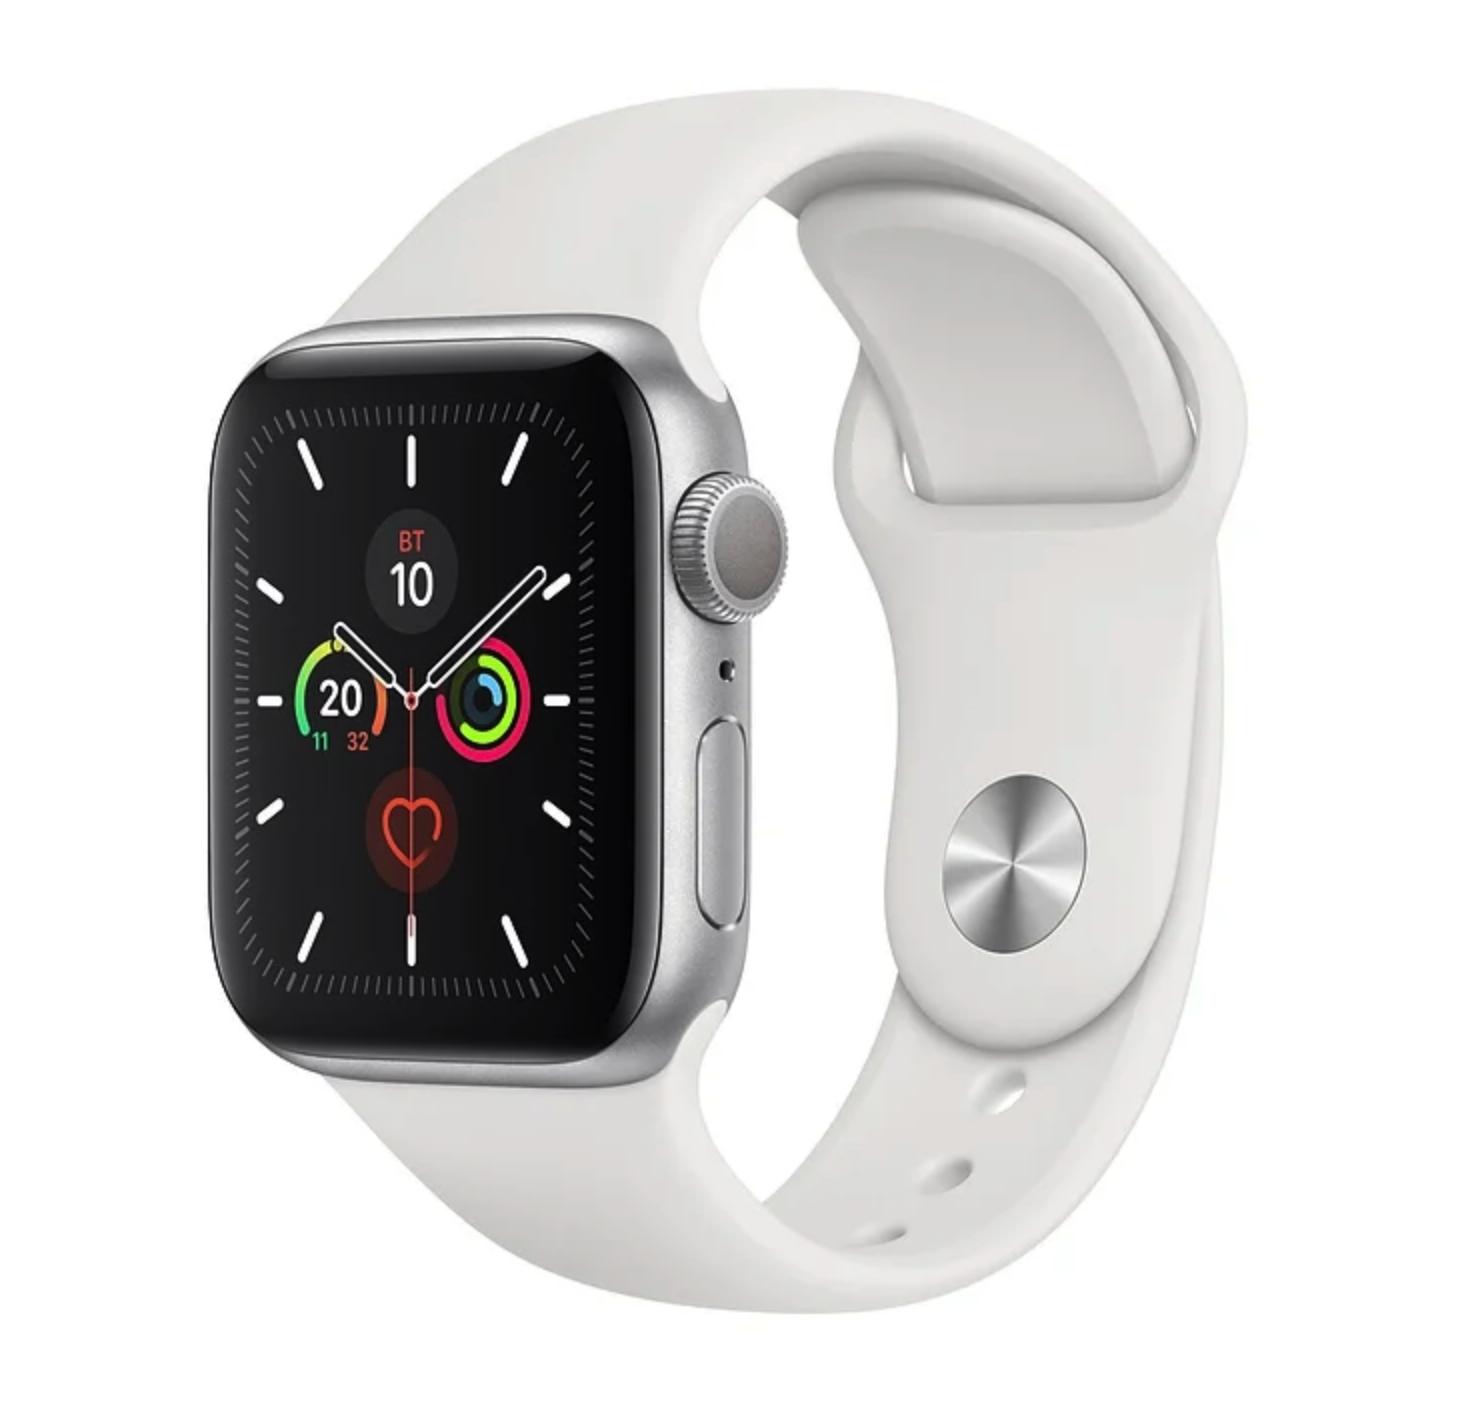 Часы Apple Watch Series 5 GPS 40mm Aluminum Case with Sport Band Silver (Серебристый/Белый)